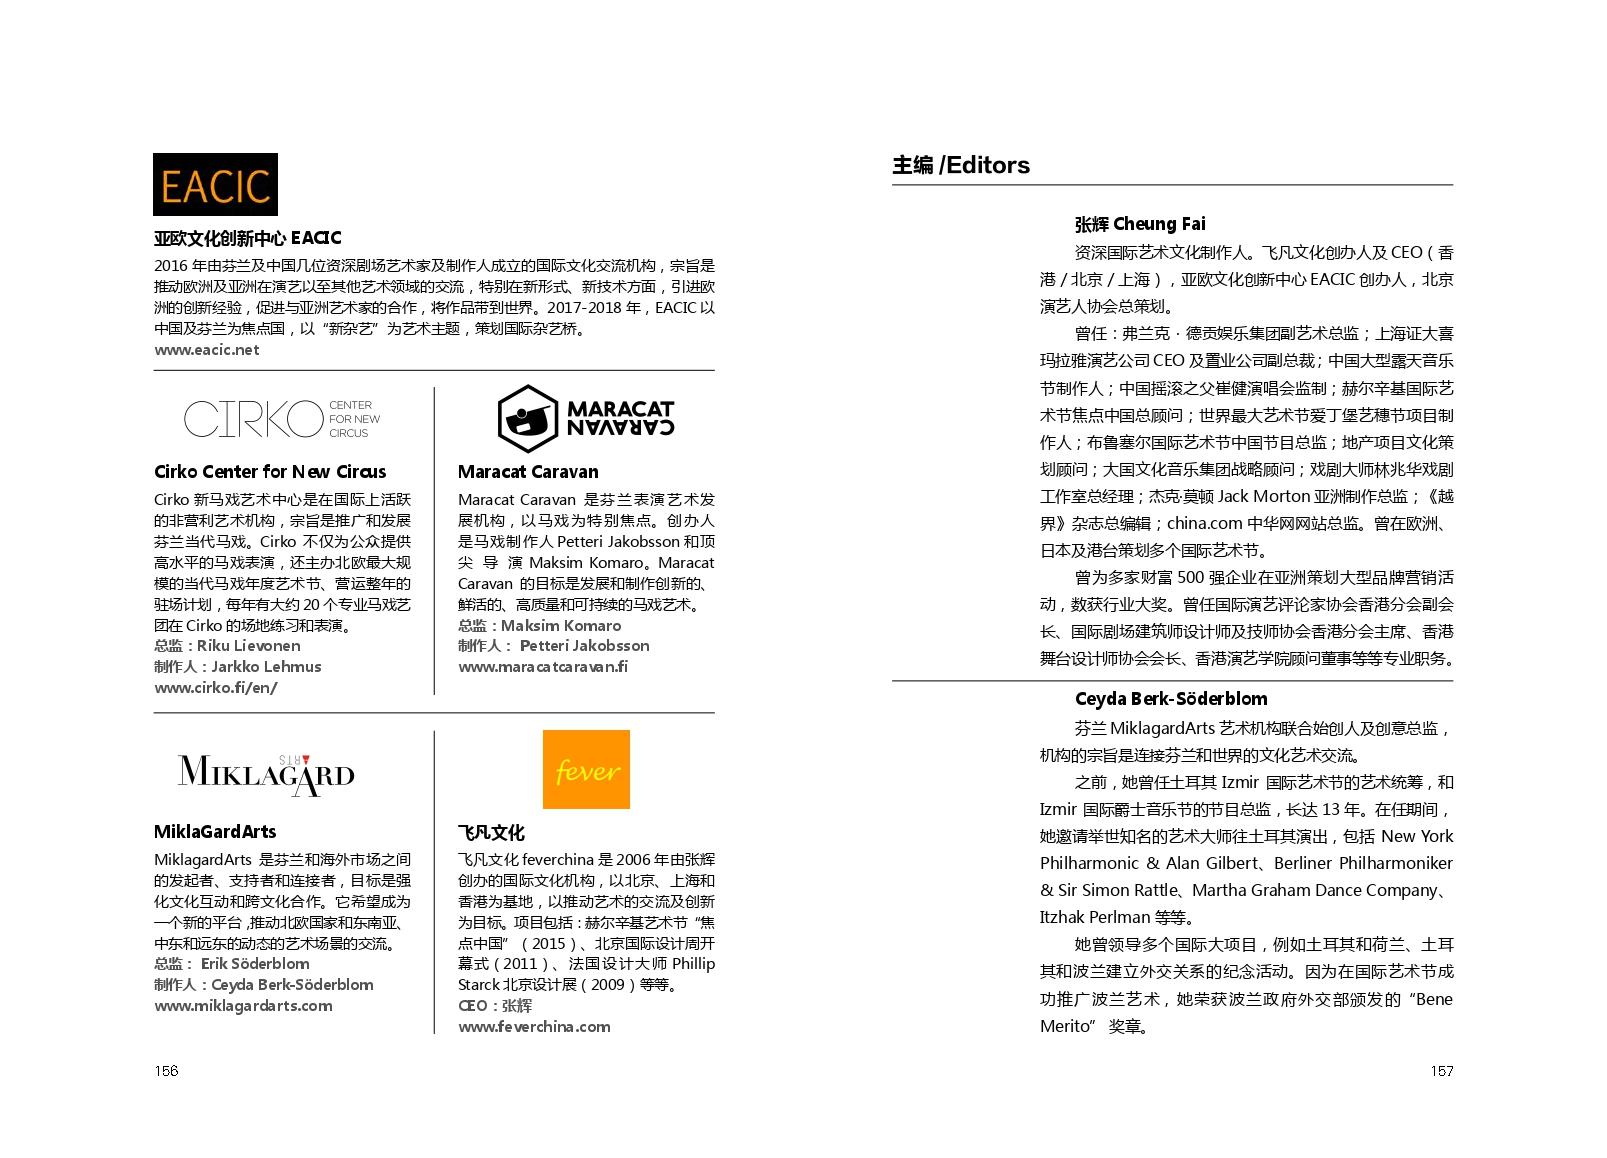 CB Book Inside final_page-0080.jpg